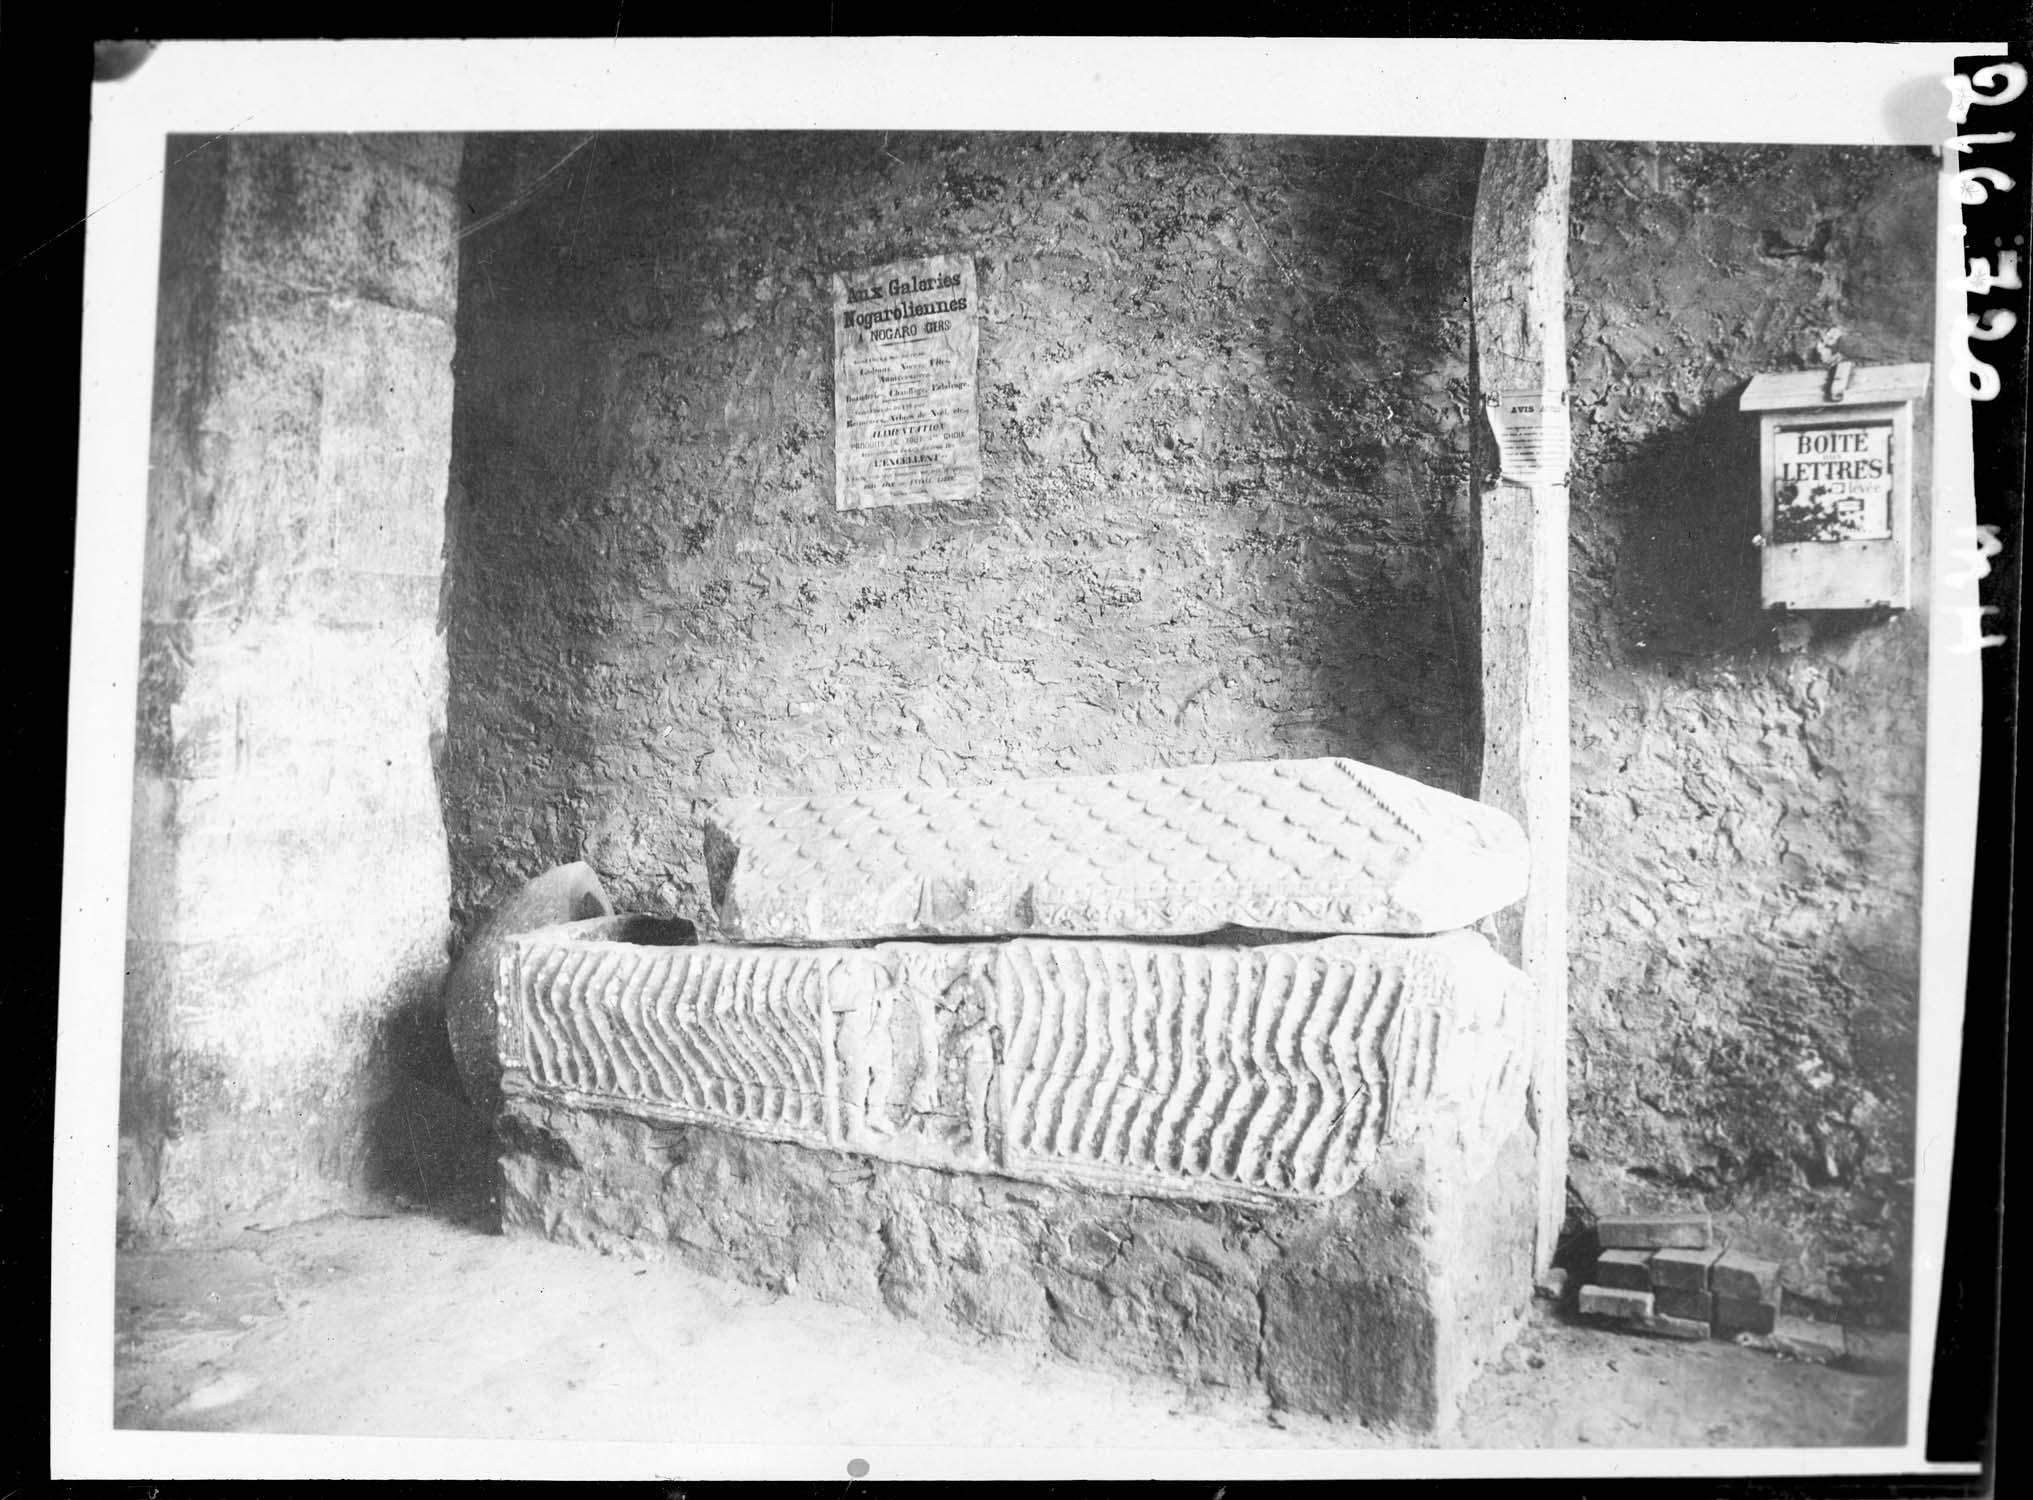 Sarcophage en pierre